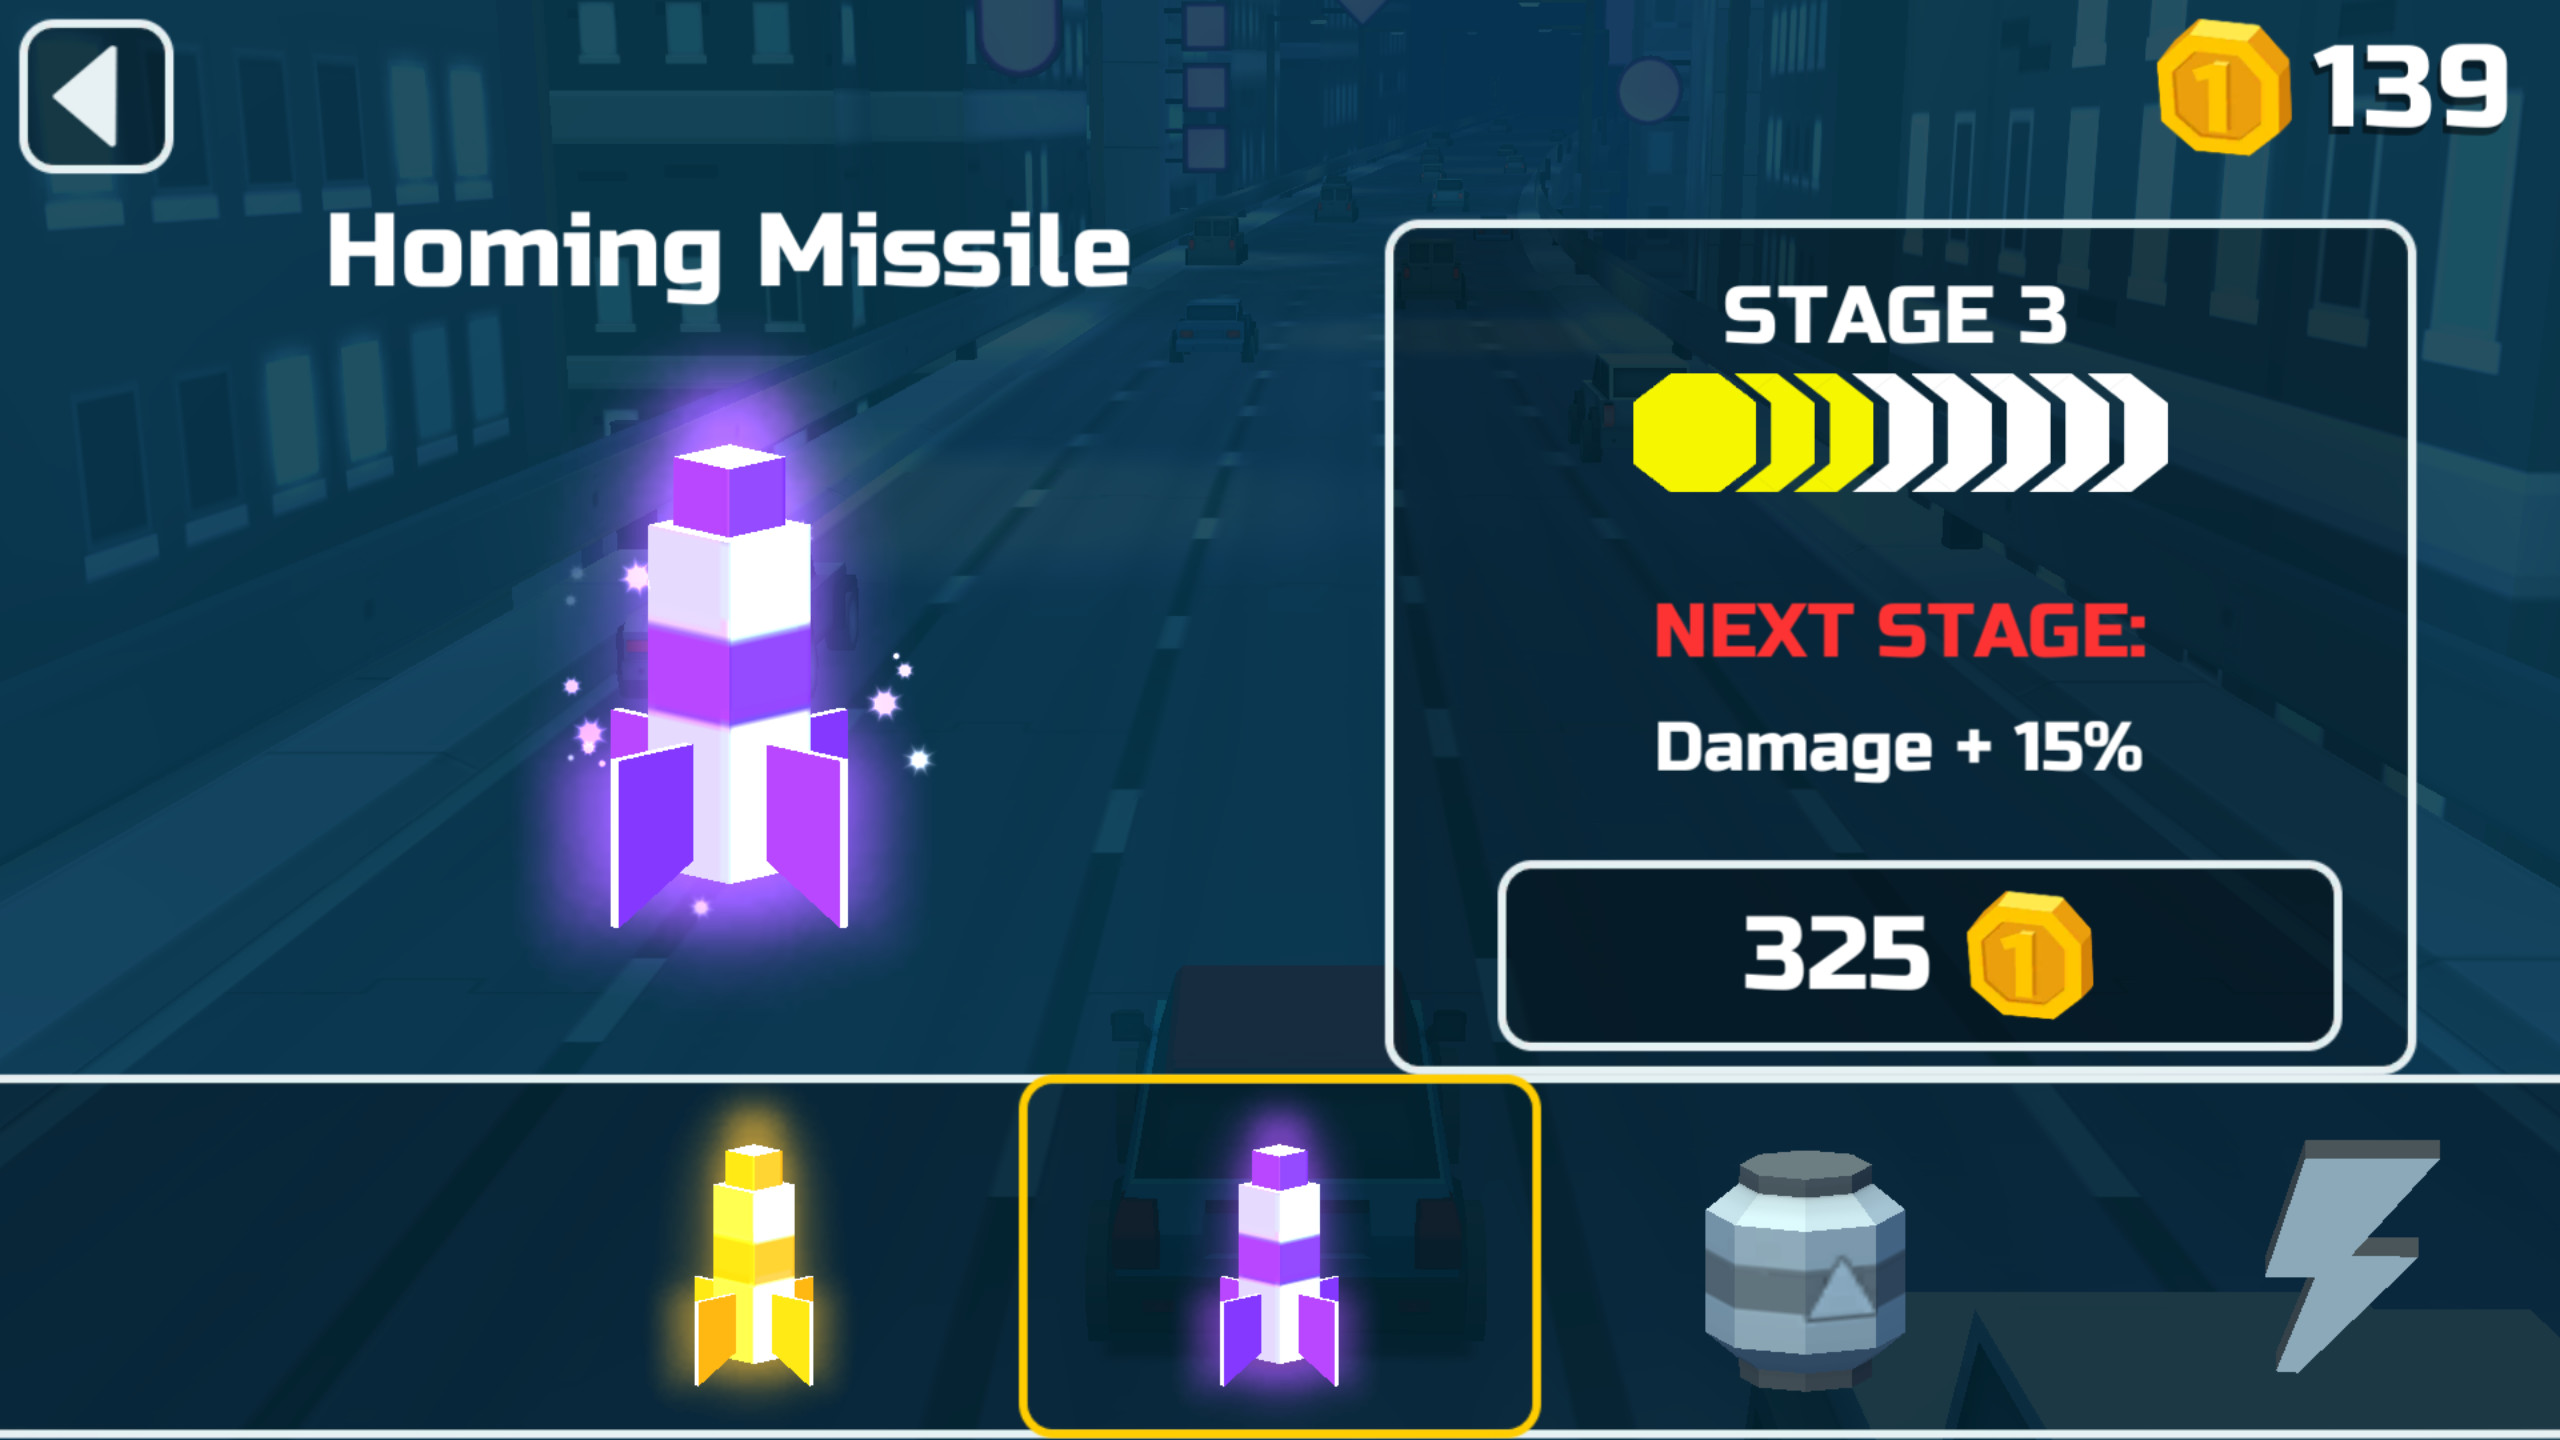 Weapon upgrade/unlock screen